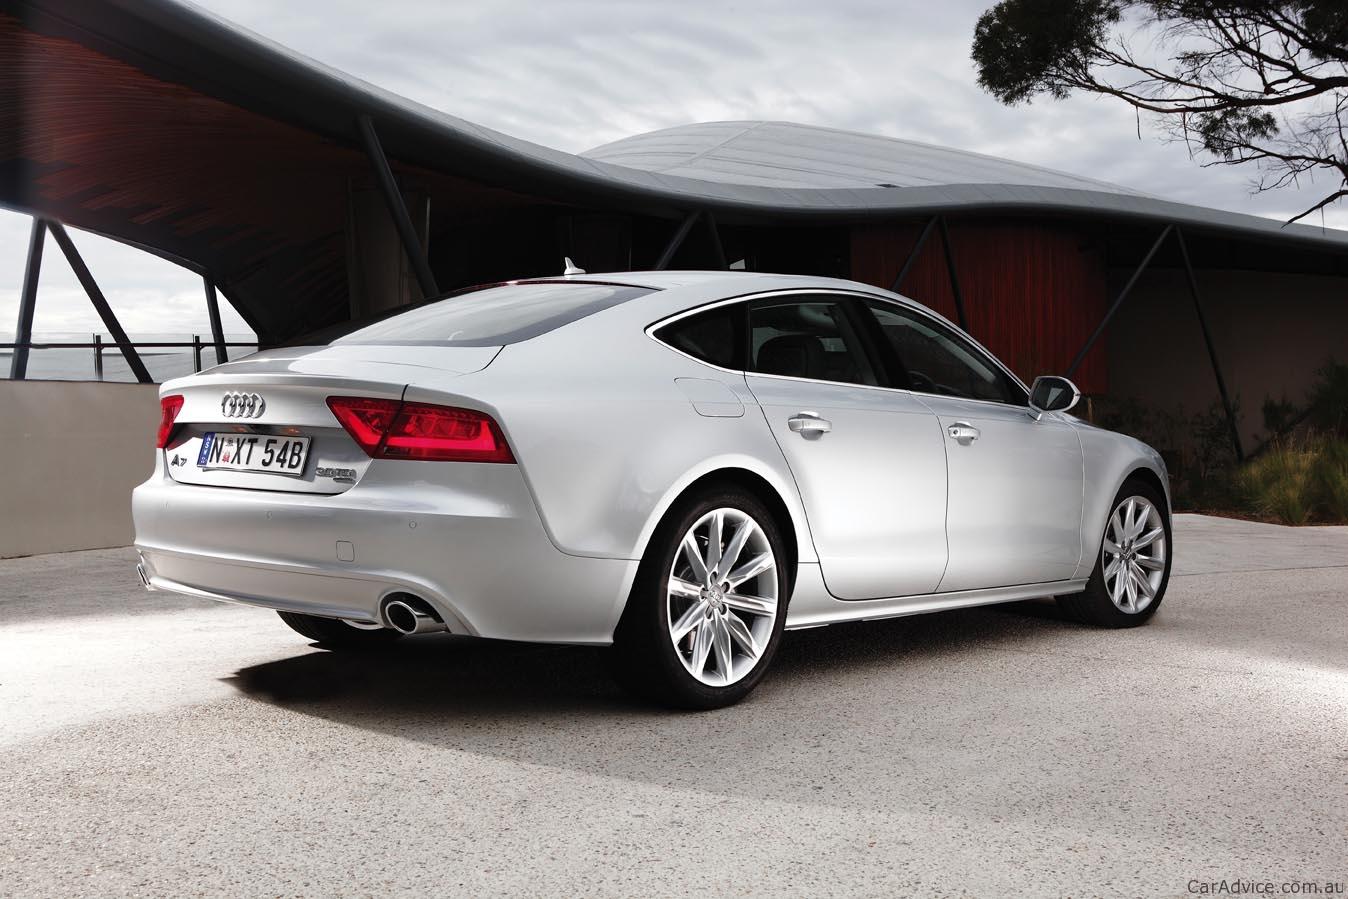 Audi Suv Models >> 2011 Audi A7 Sportback launched in Australia - photos | CarAdvice